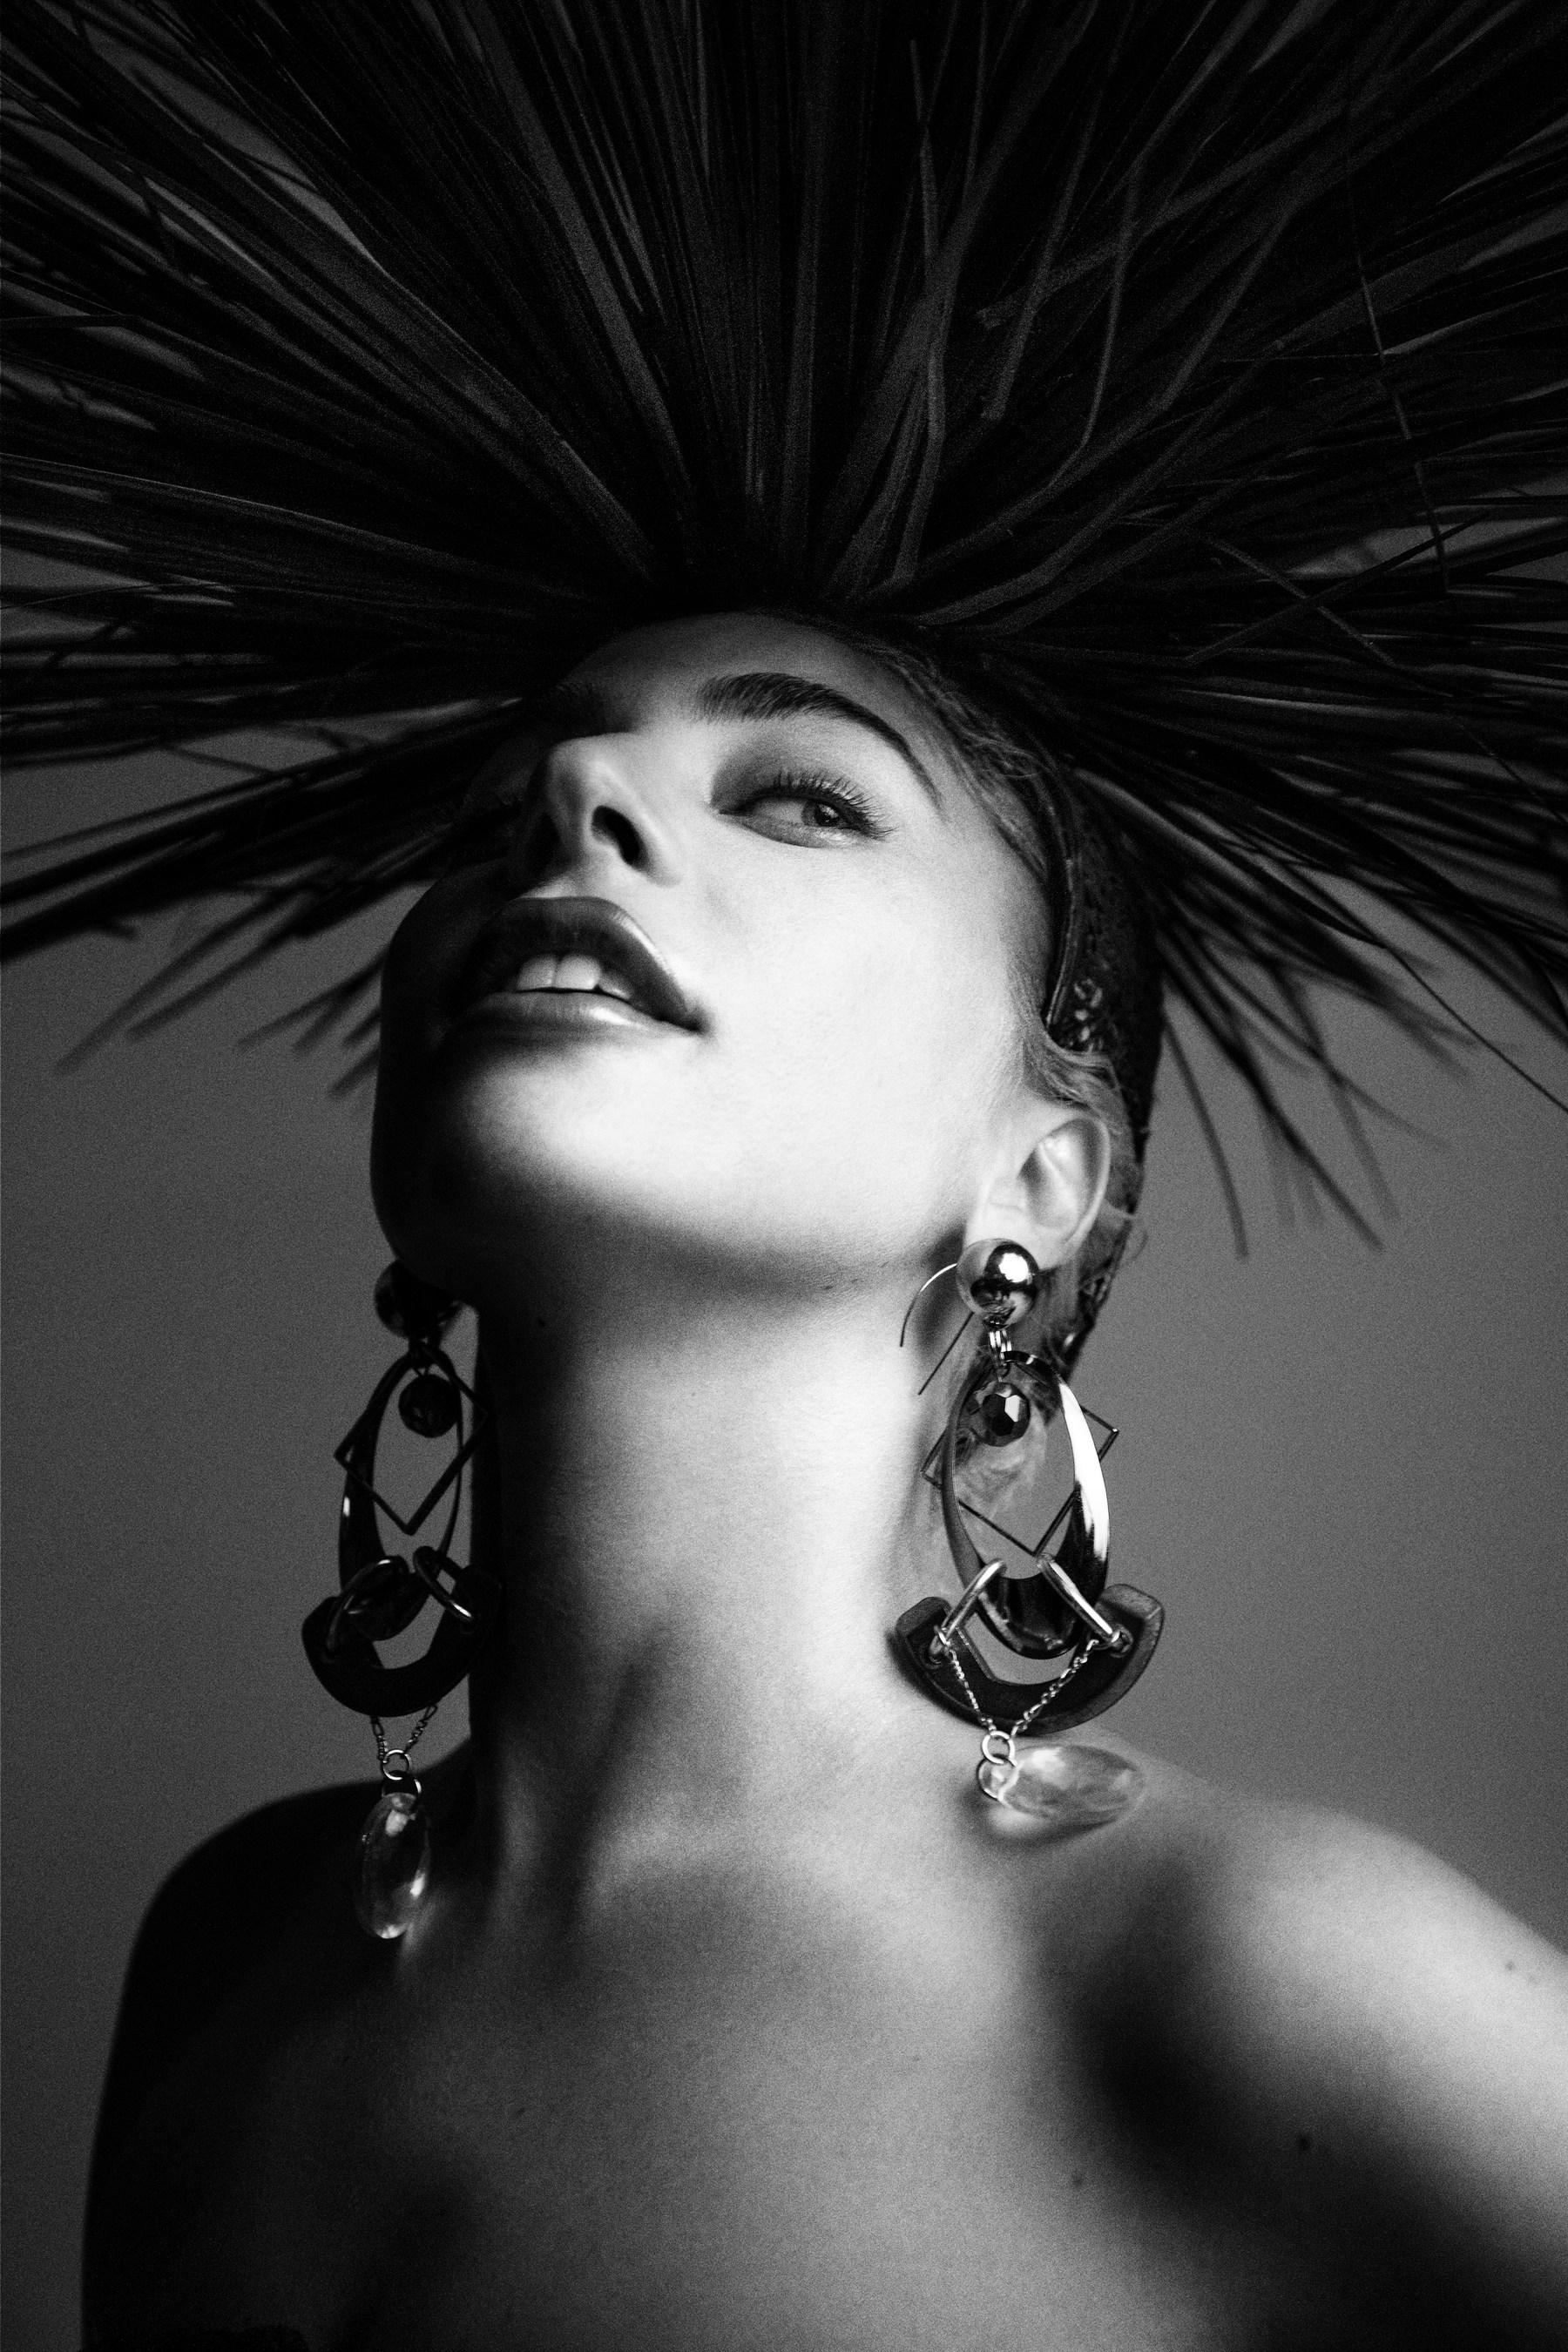 Grammy Award Winning Superstar Lady Gaga To Launch Exclusive Las